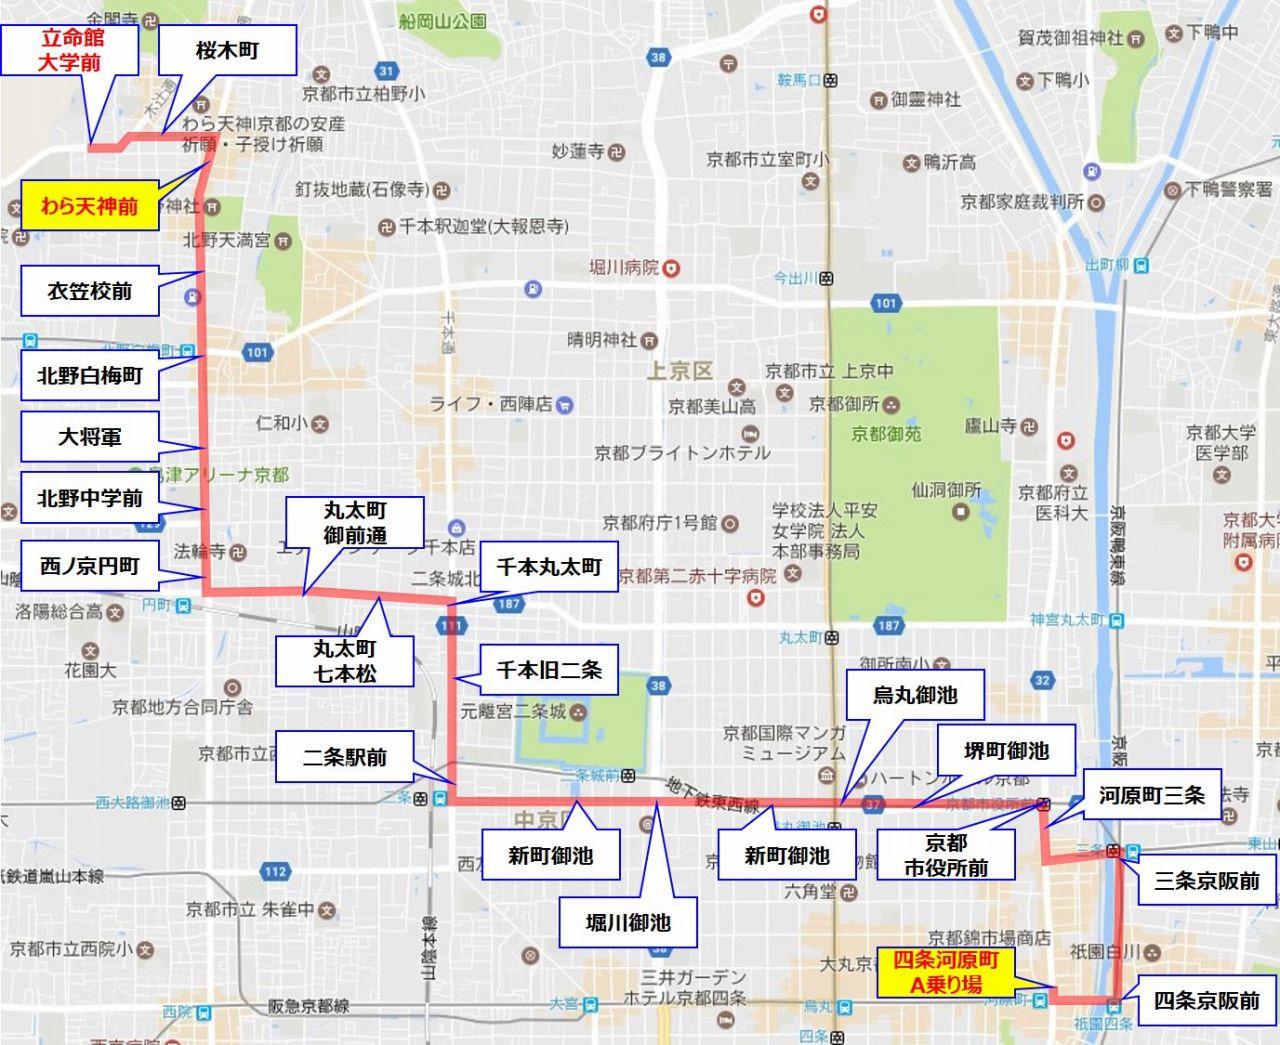 bus-stop-15